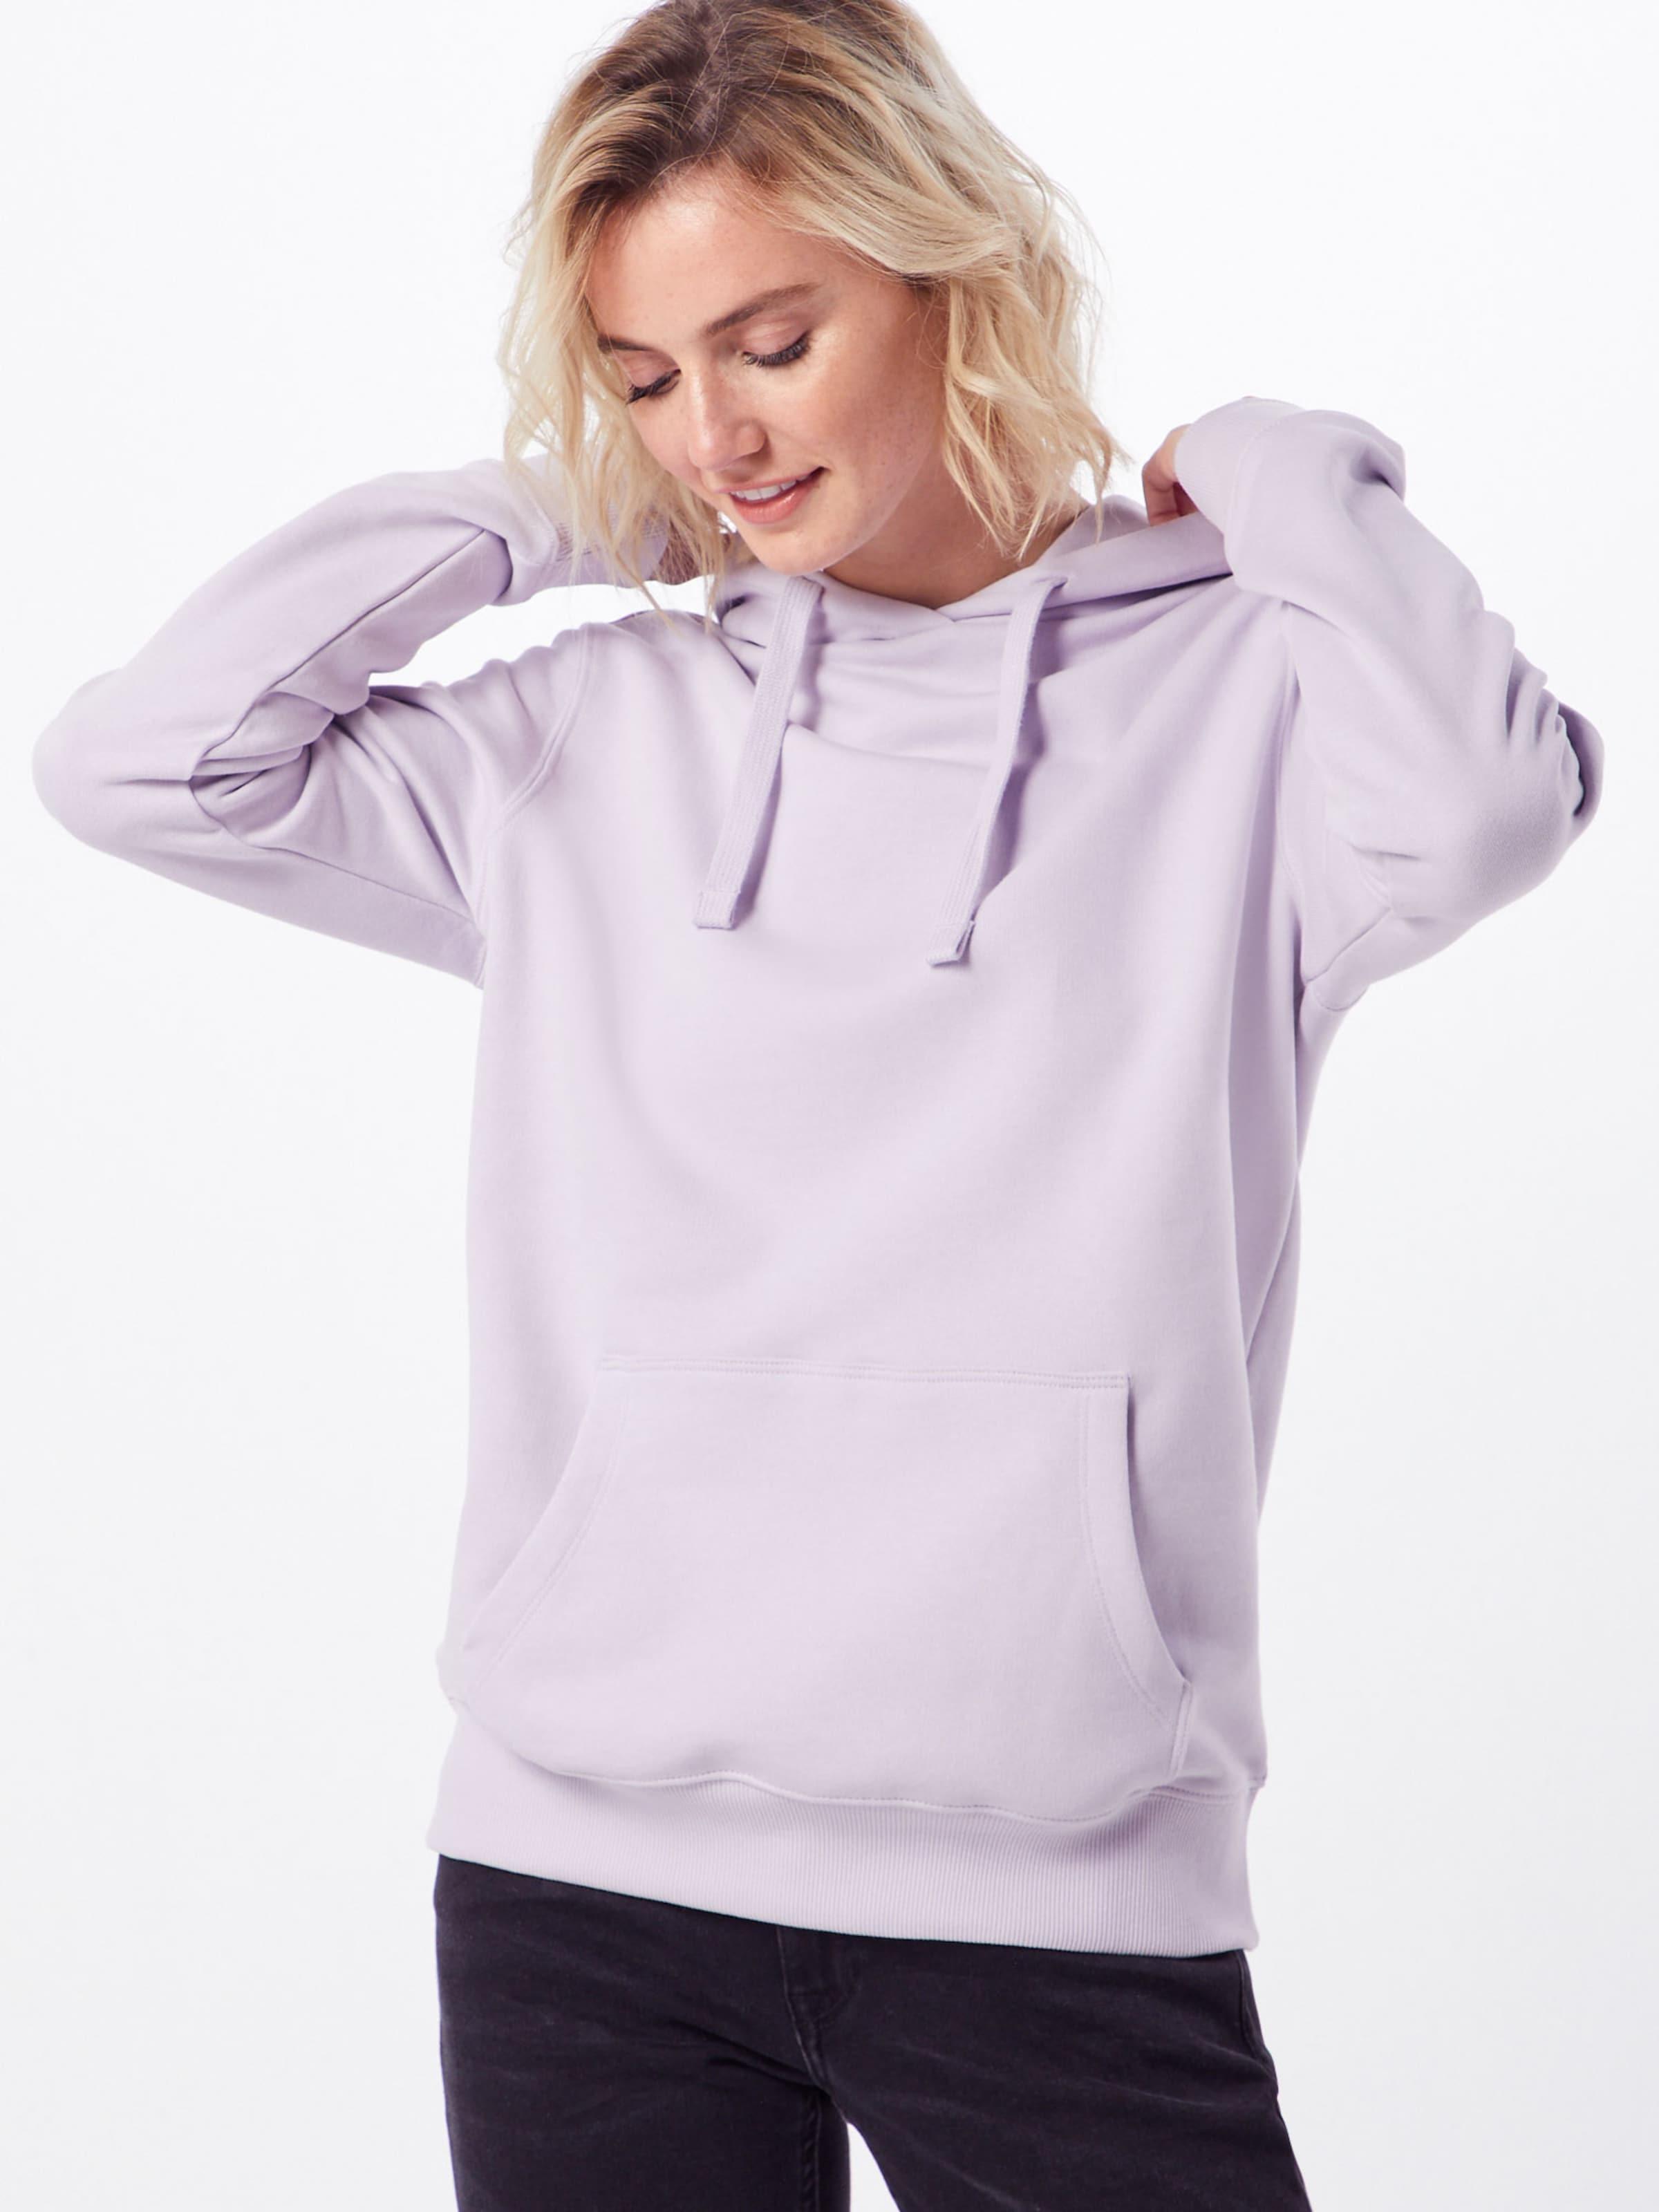 Review Review Review Sweatshirt Lila Lila Sweatshirt In Sweatshirt Lila In In erCBxdo